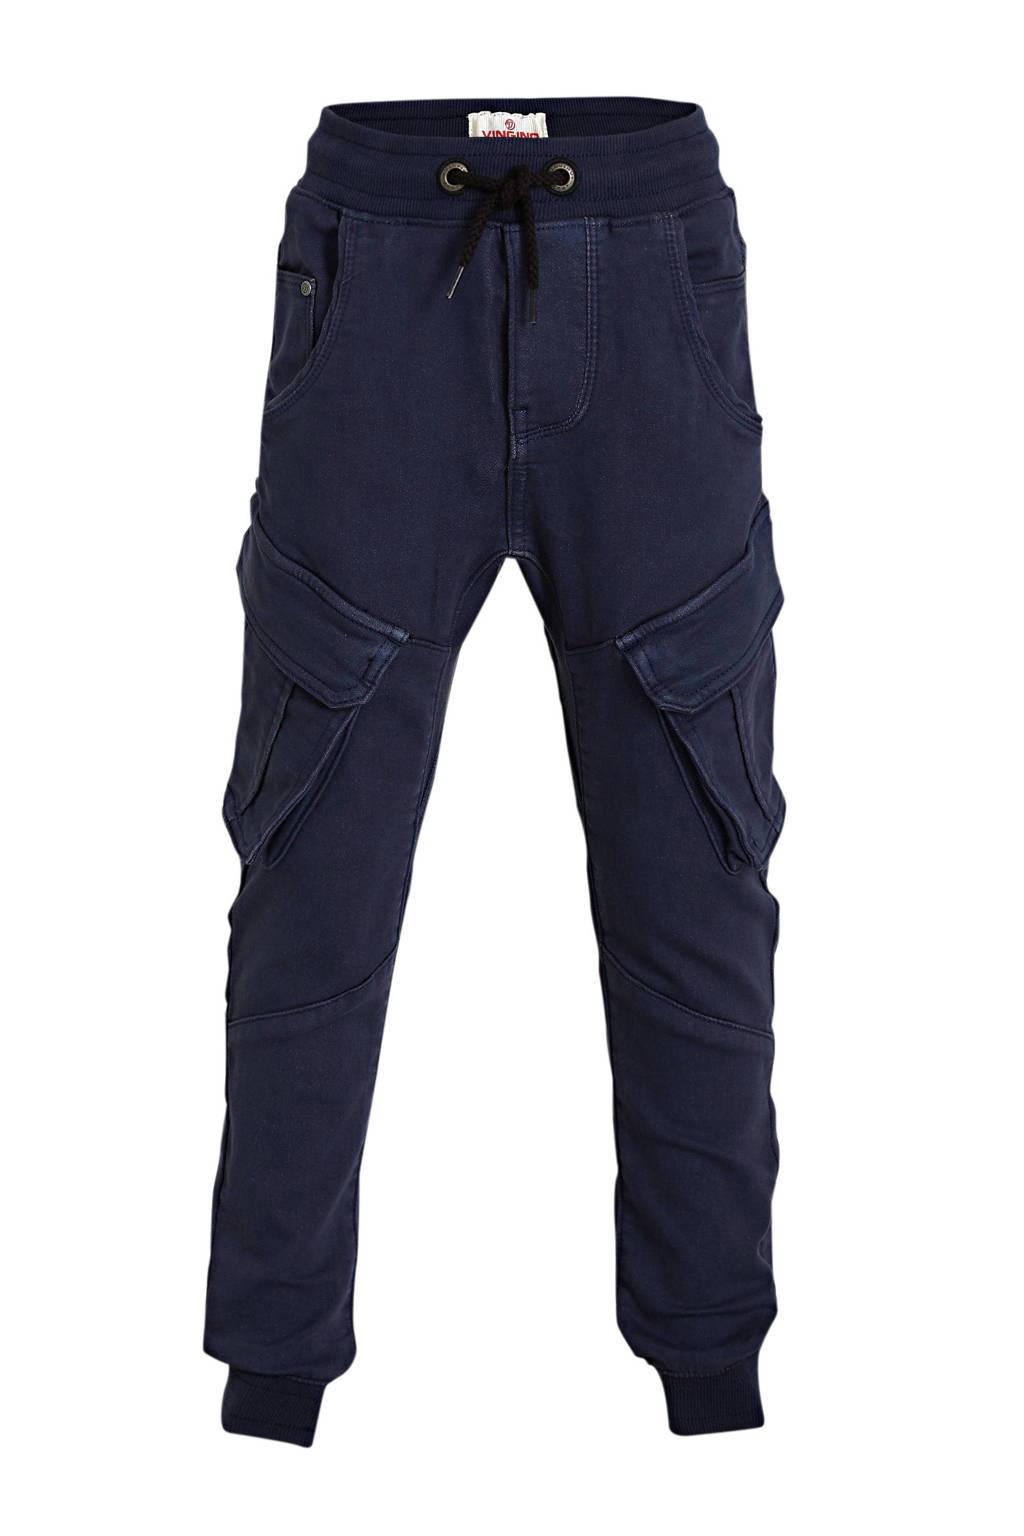 Vingino loose fit cargobroek Carlos donkerblauw, Donkerblauw